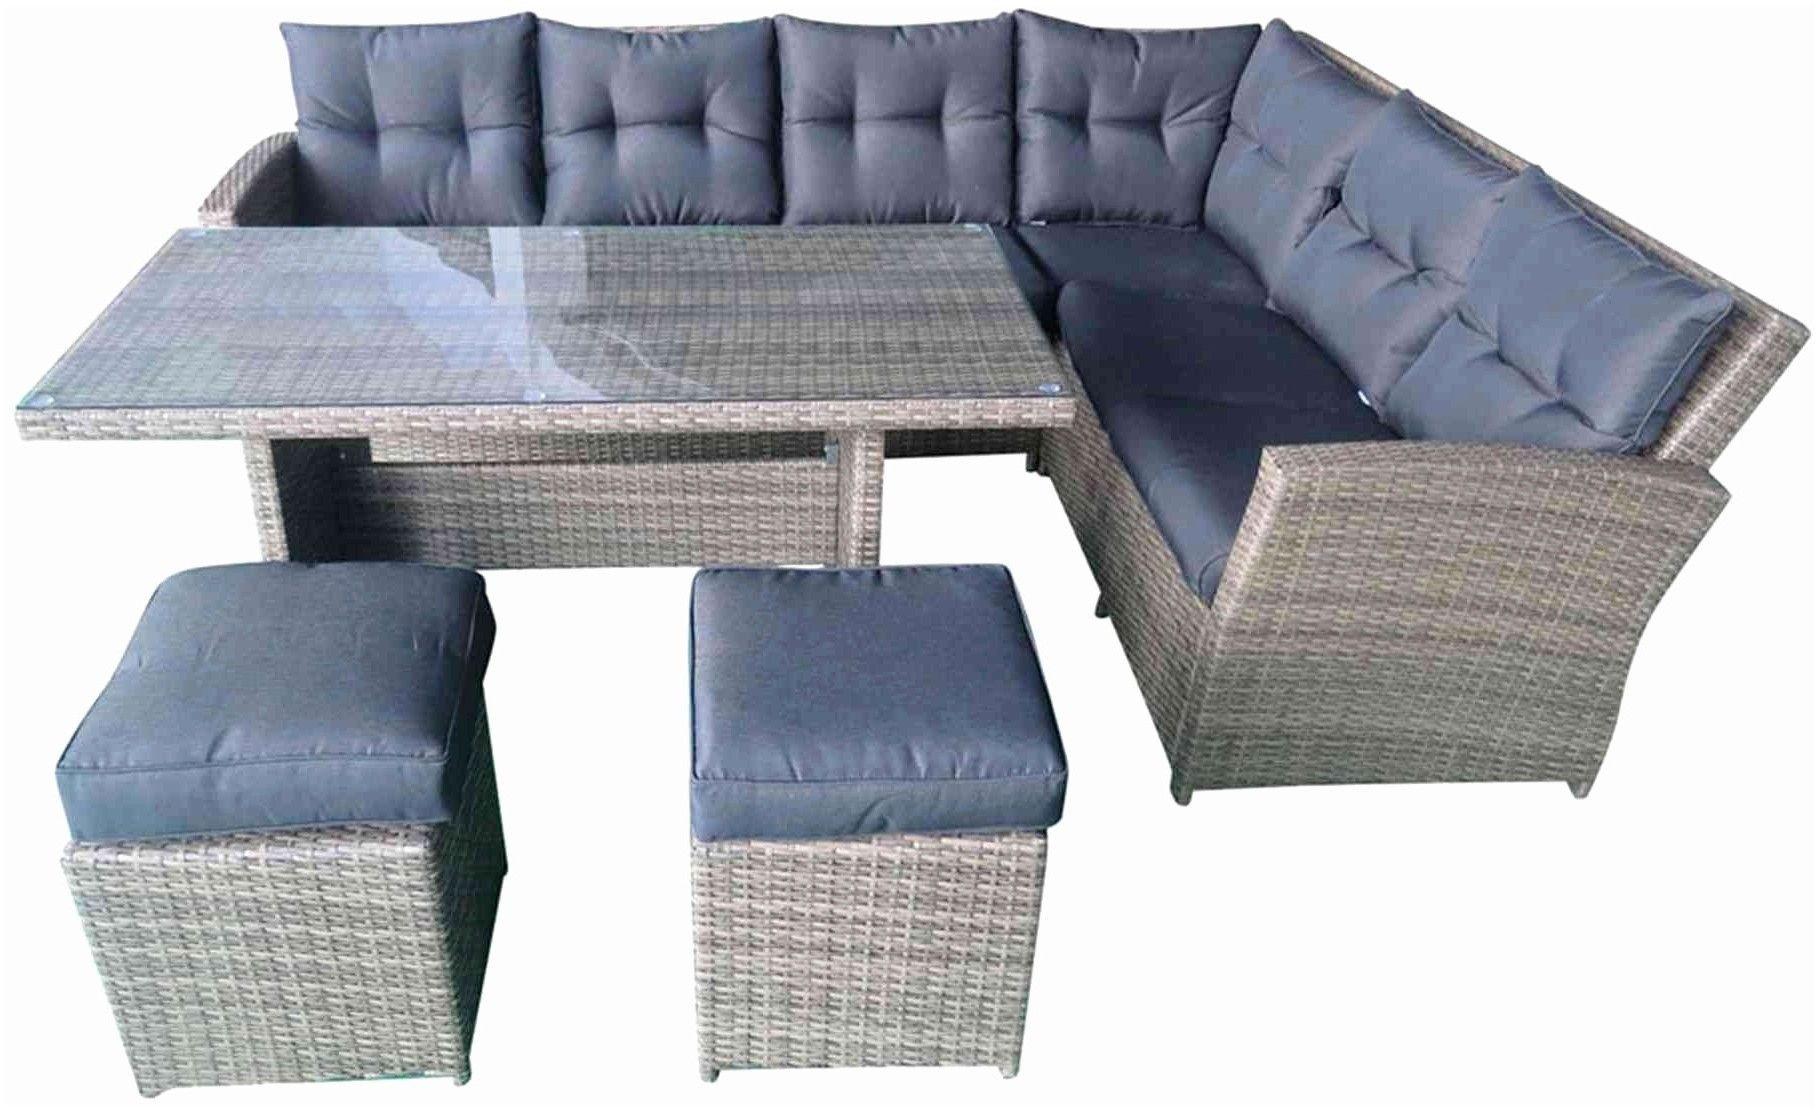 54 Concept Carrefour Meuble Salon concernant Salon De Jardin Resine Carrefour